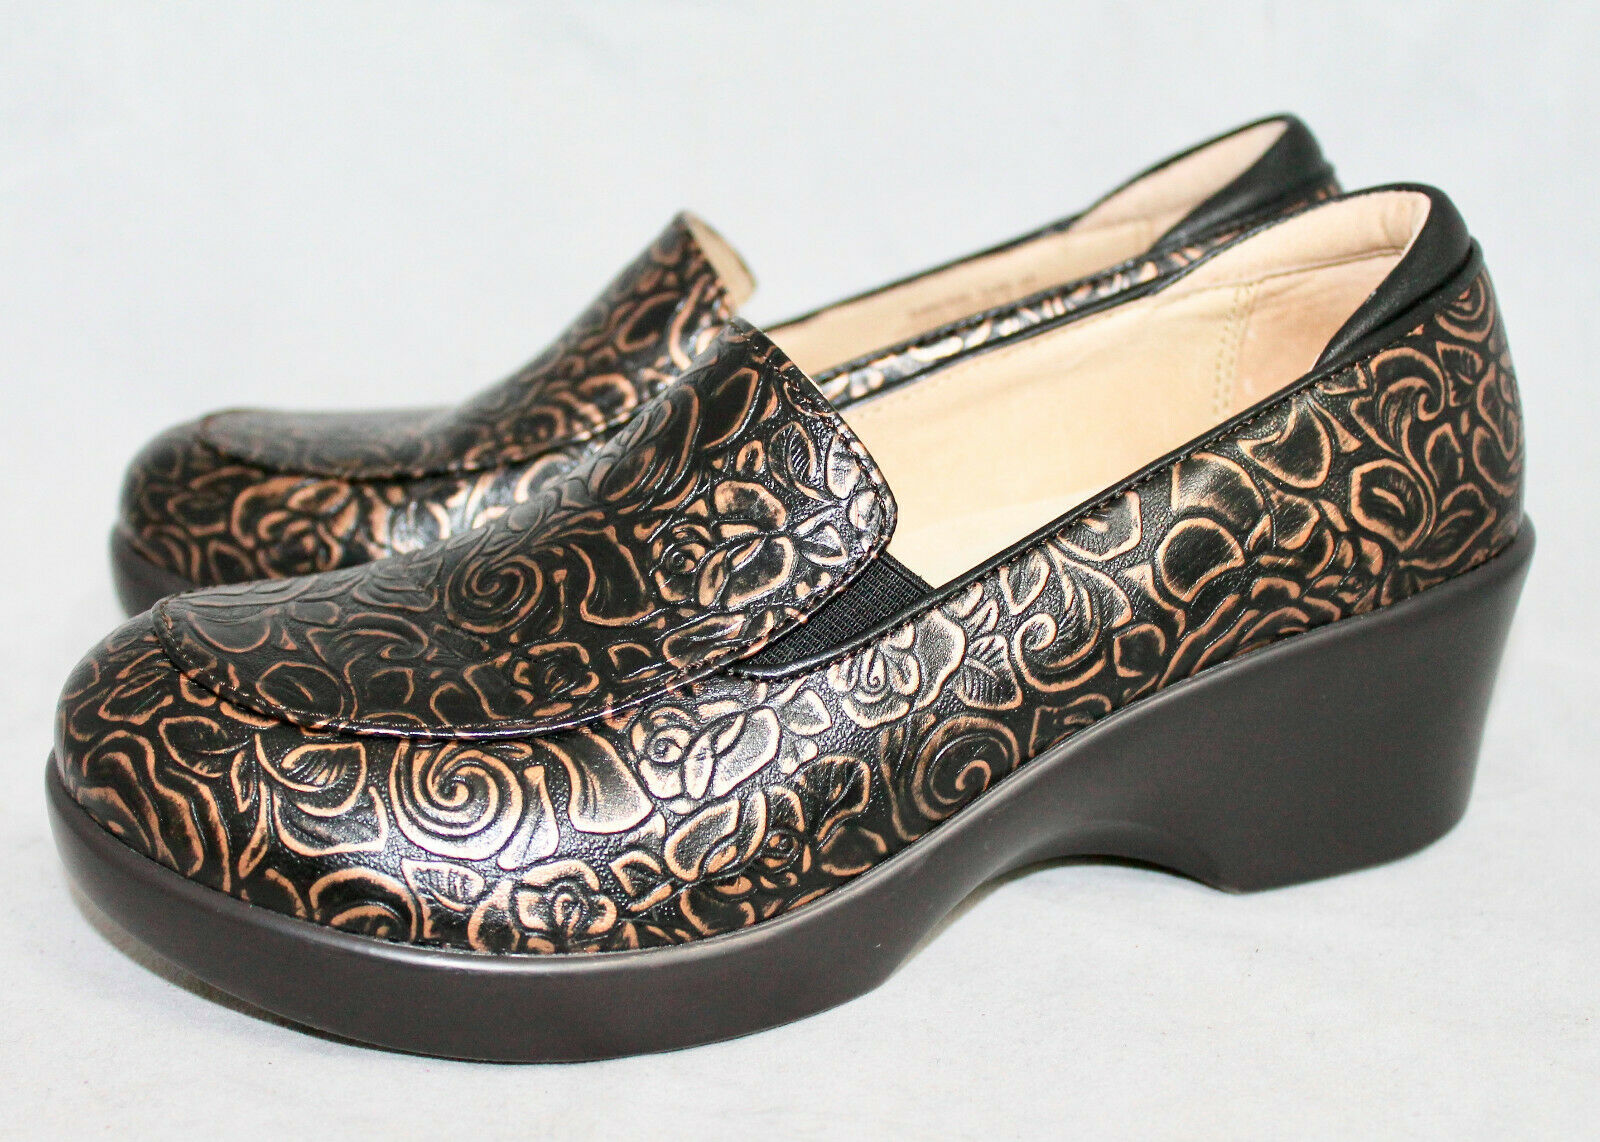 ALEGRIA EMM-548 Emma Bronze Boquet Clogs Wo's 7-7.5 Eu 37 Leather Comfort chaussures